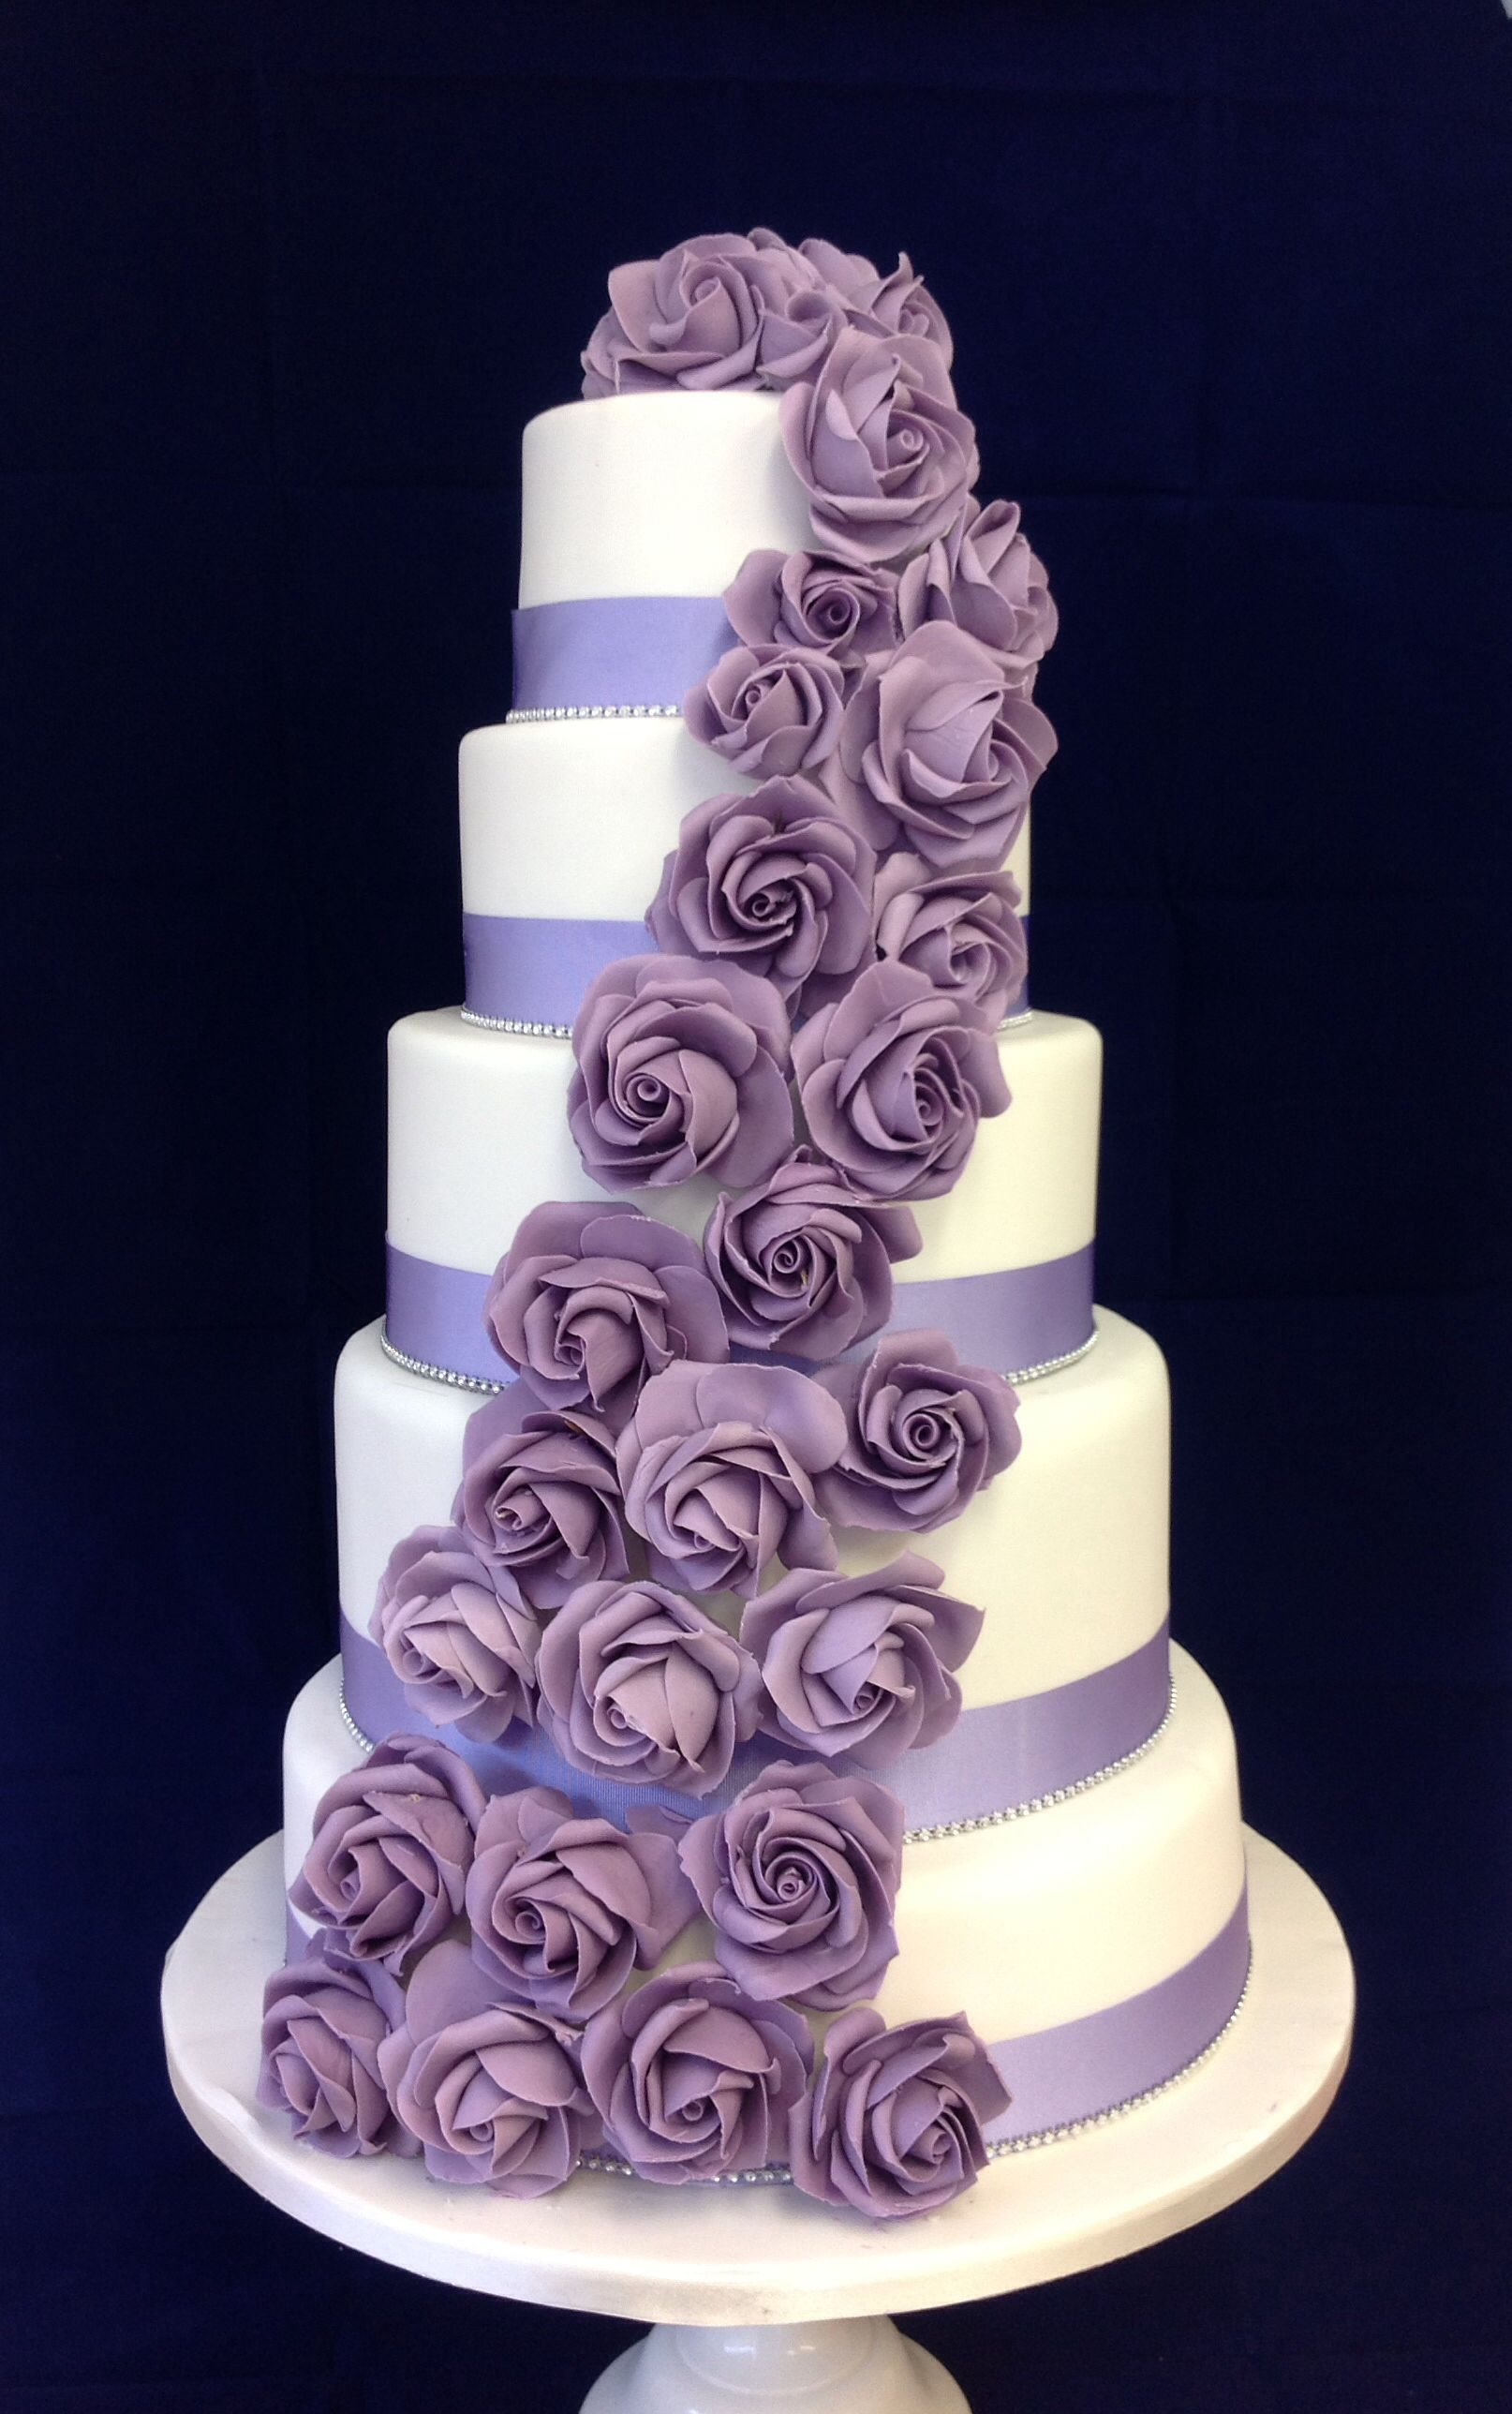 stunning 5 tier wedding cake with purple rose cascade. wedding